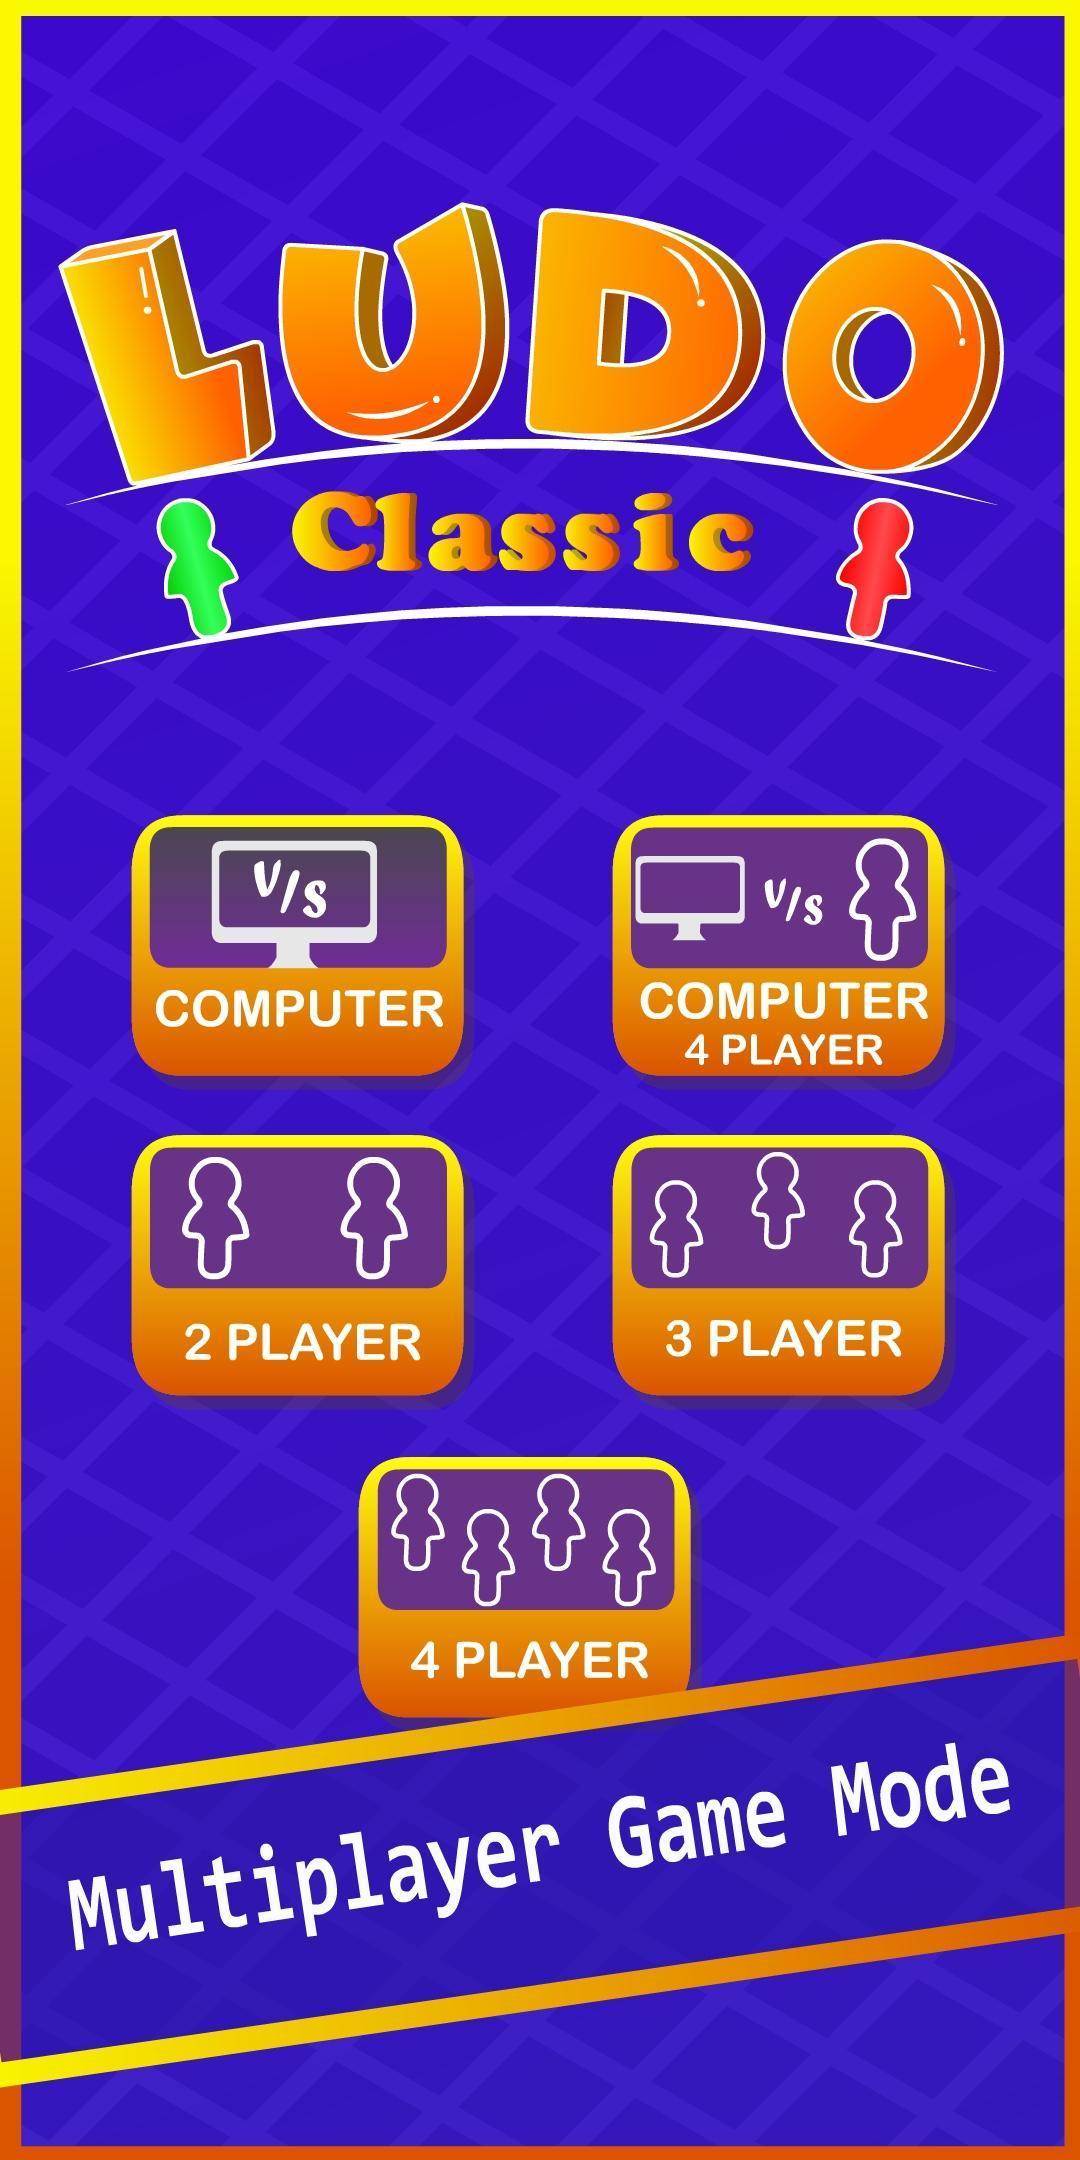 Ludo Club - Ludo Classic - King of Board Games 👑 1.5 Screenshot 7